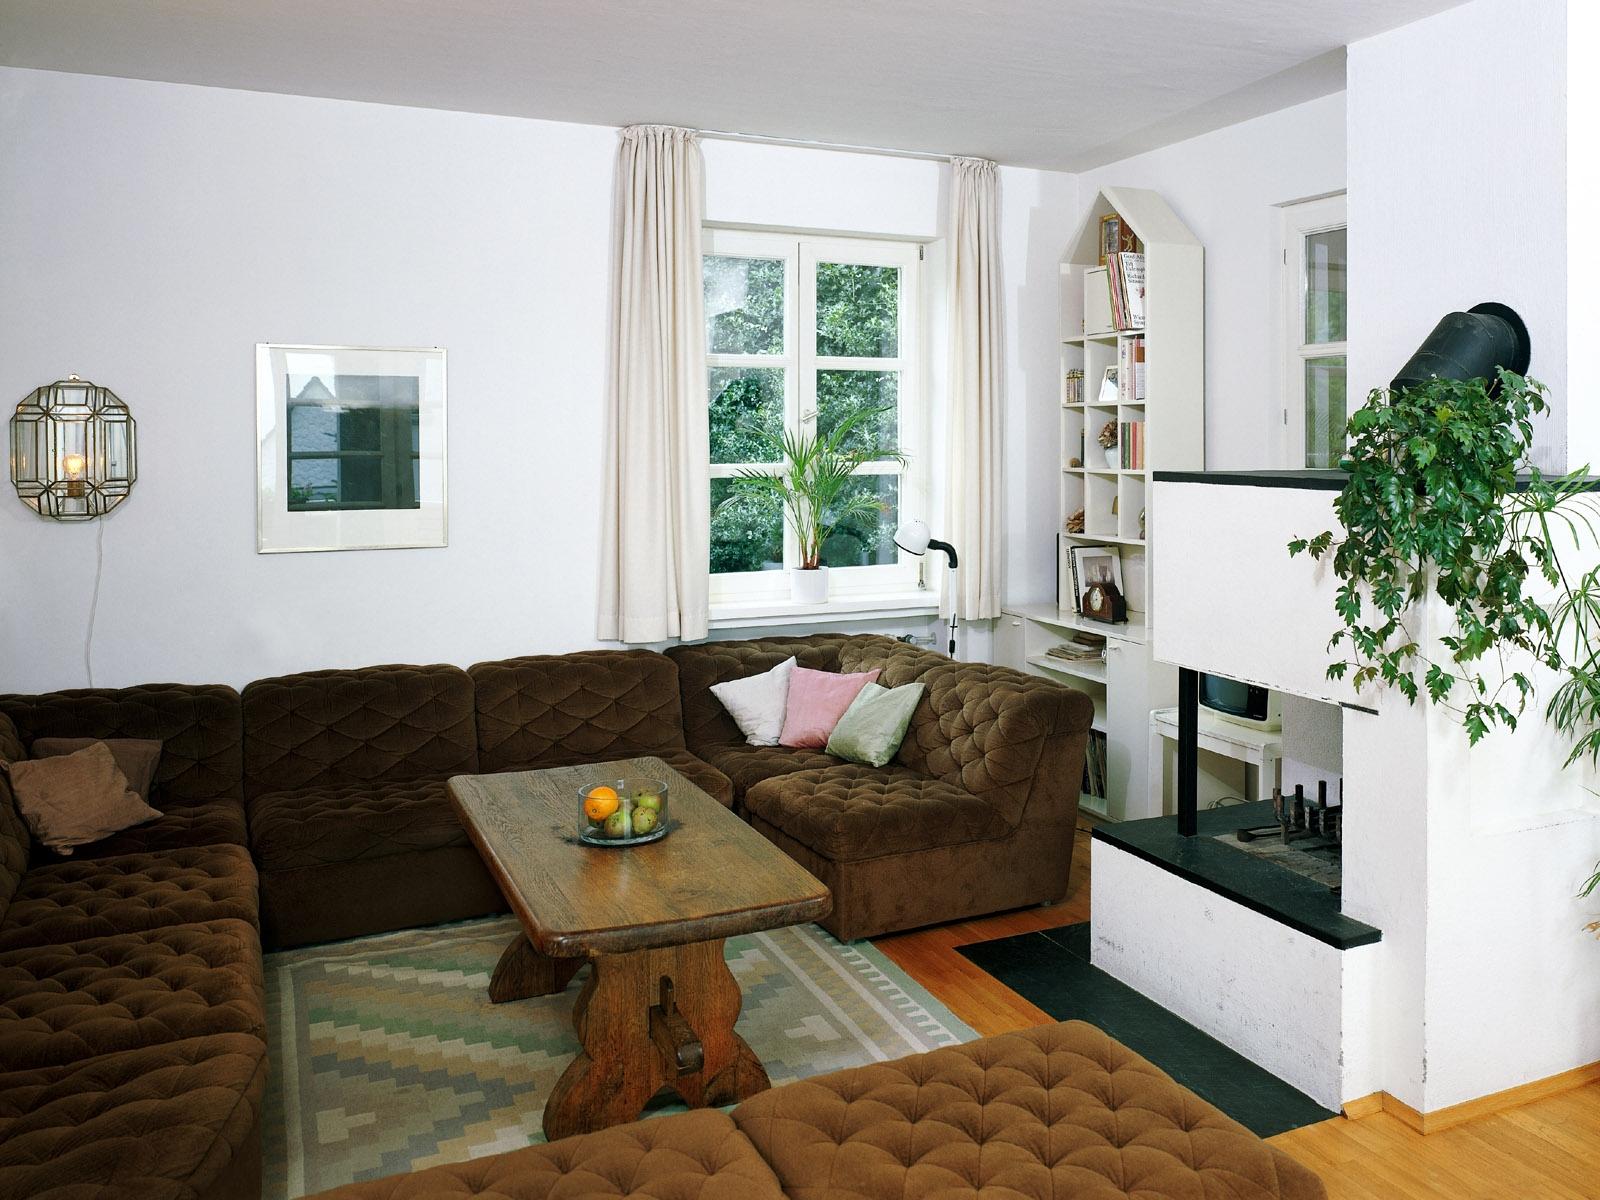 Fondos de pantalla : ventana, habitación, diseño de interiores ...